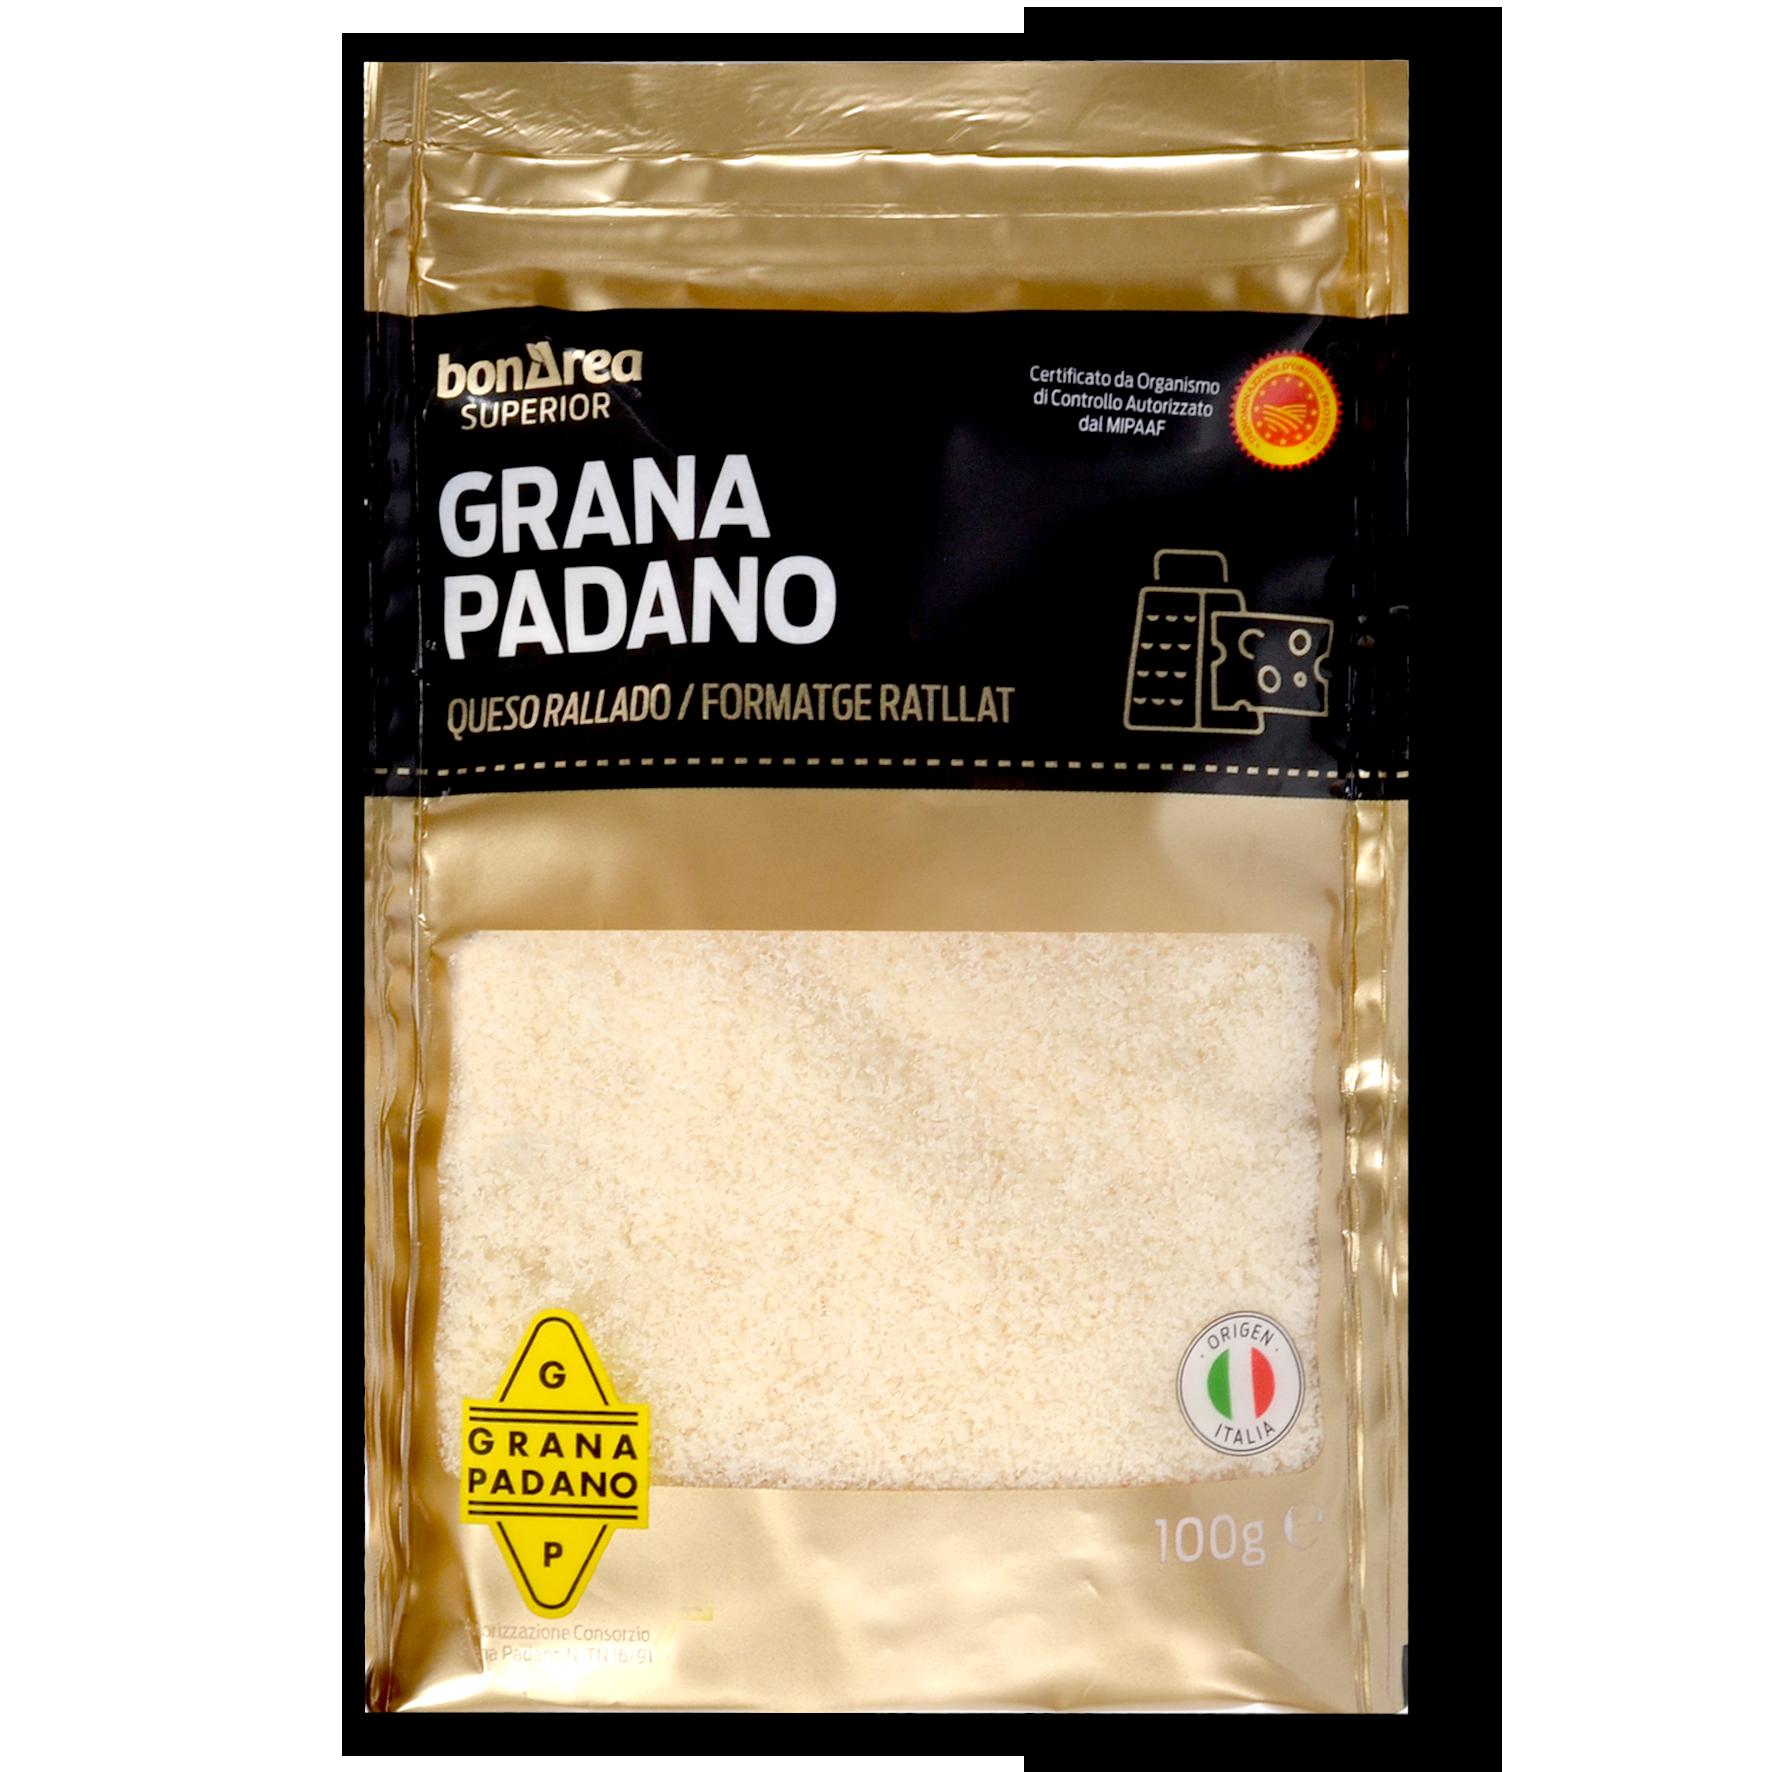 Formatge ratllat Grana Padano